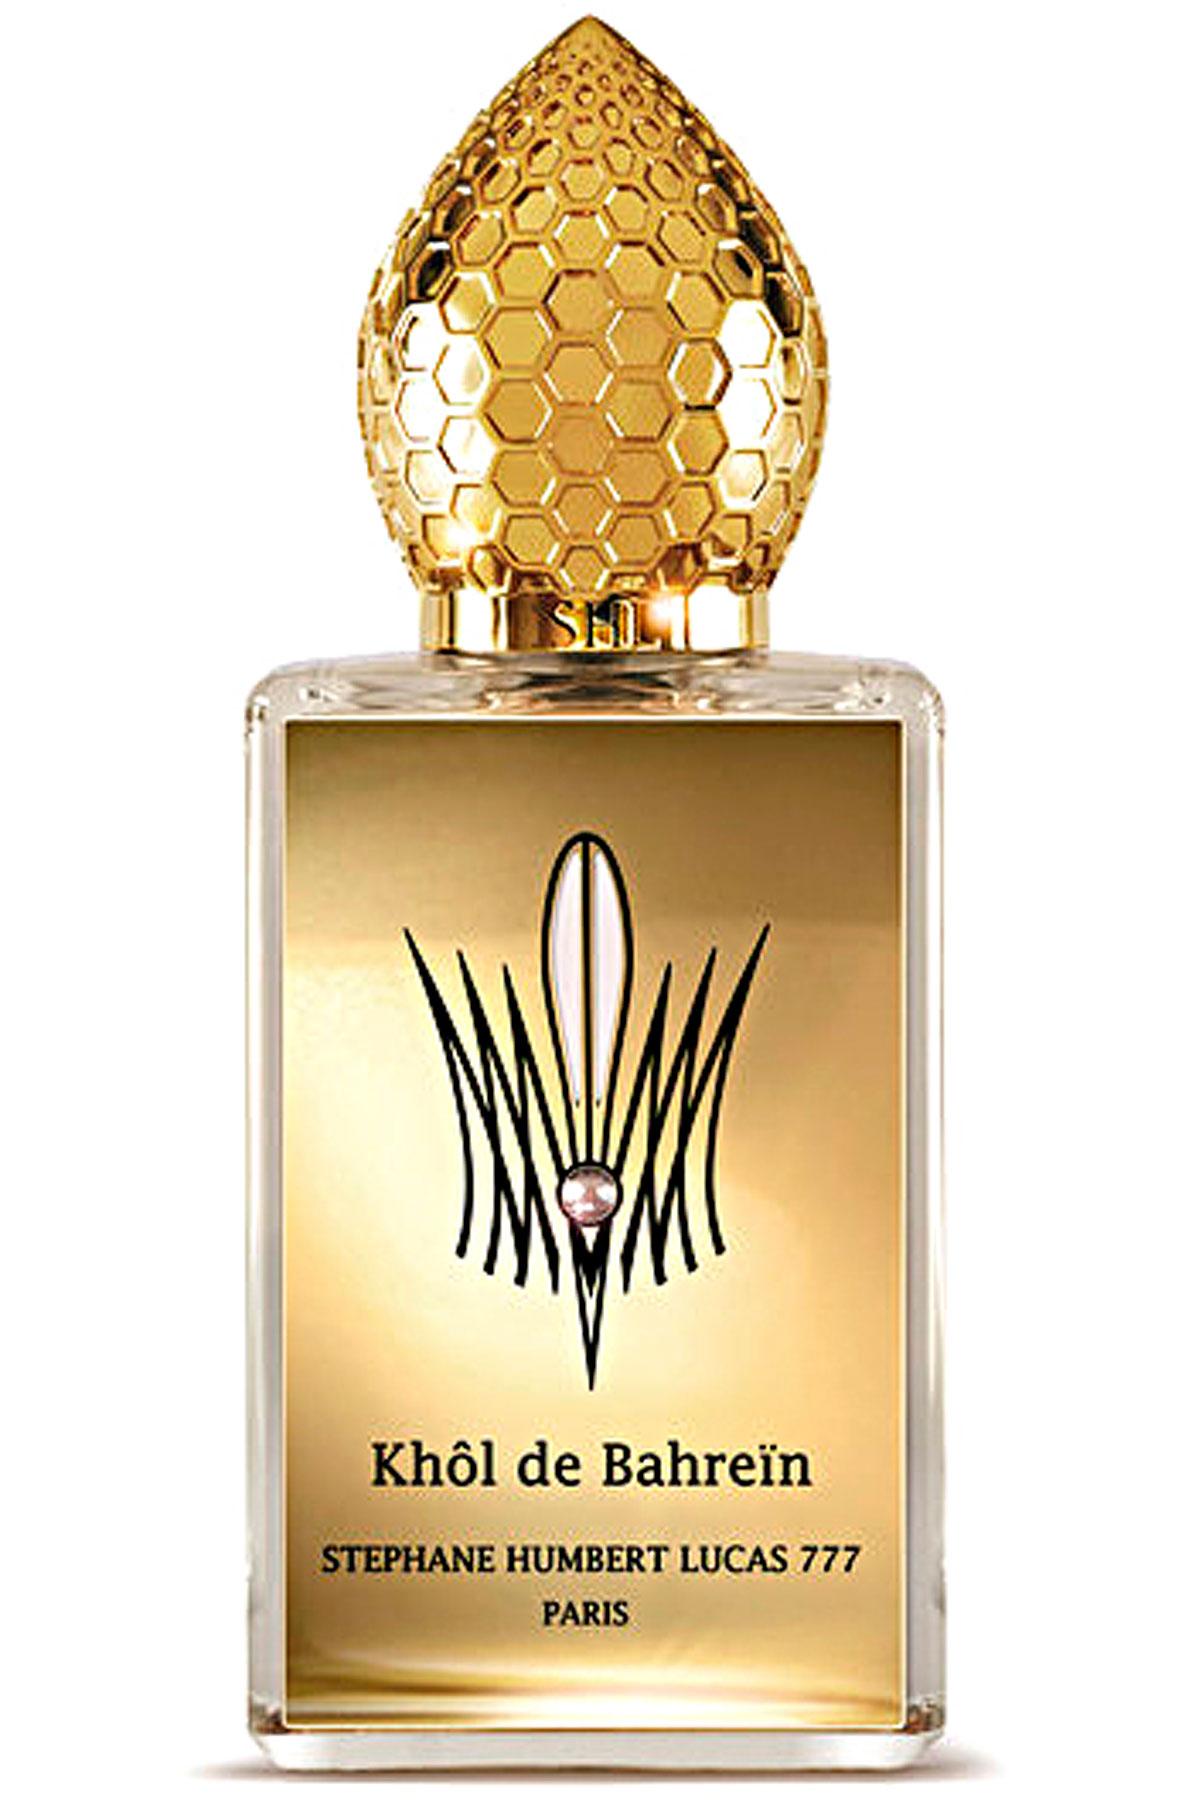 Stephane Humbert Lucas 777 Paris Fragrances for Women, Khol De Bahrein - Eau De Parfum - 50 Ml, 2019, 50 ml